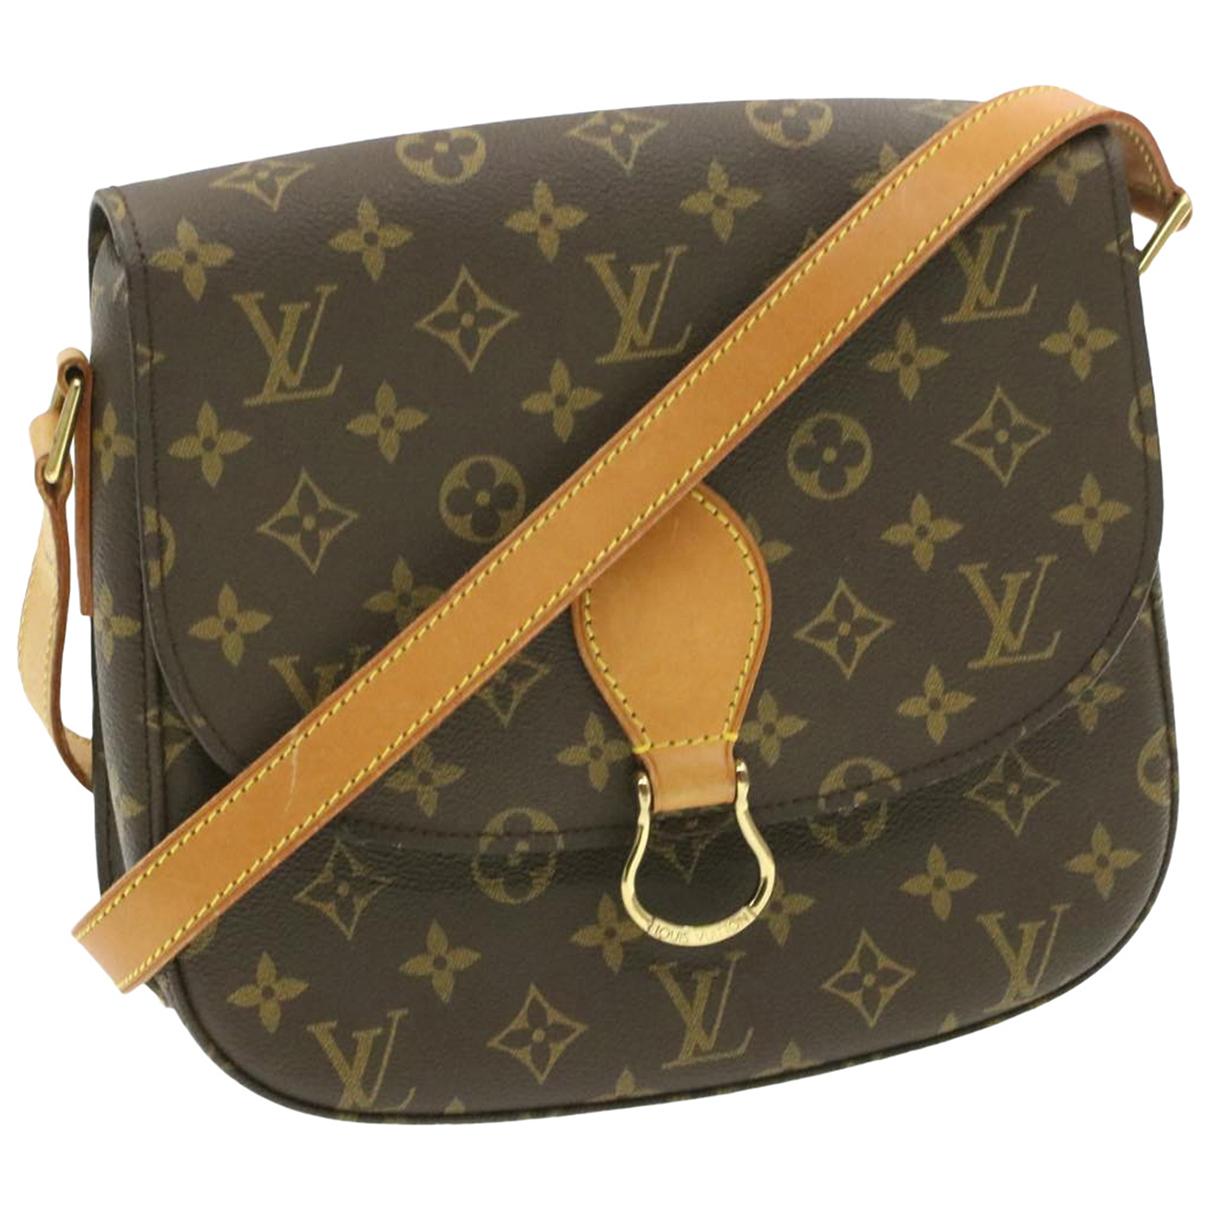 Louis Vuitton Saint Cloud Handtasche in  Braun Leinen